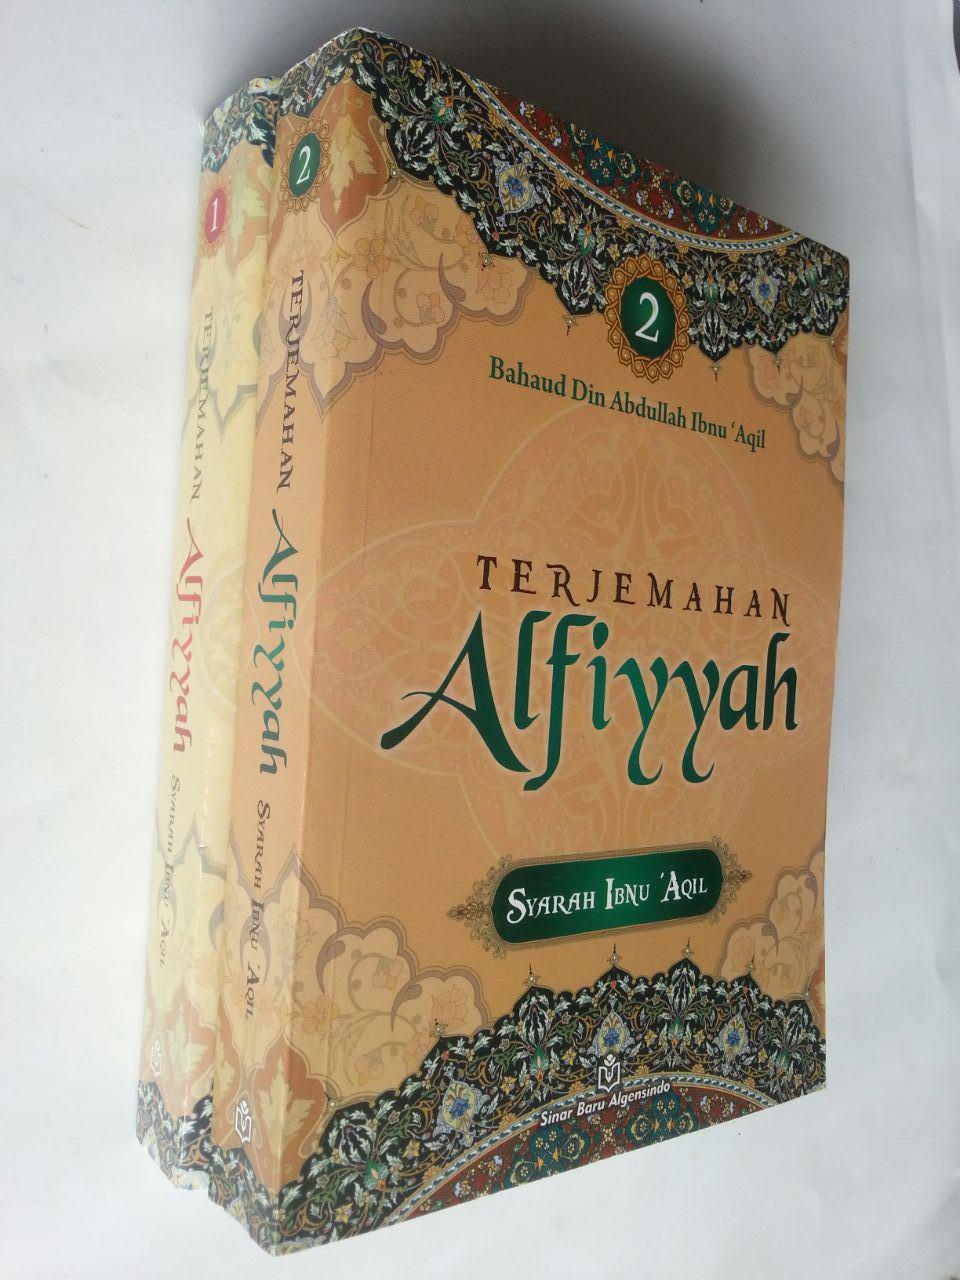 Buku Terjemahan Alfiyyah Syarah Ibnu Aqil Soft Cover Set 2 Jilid cover 2